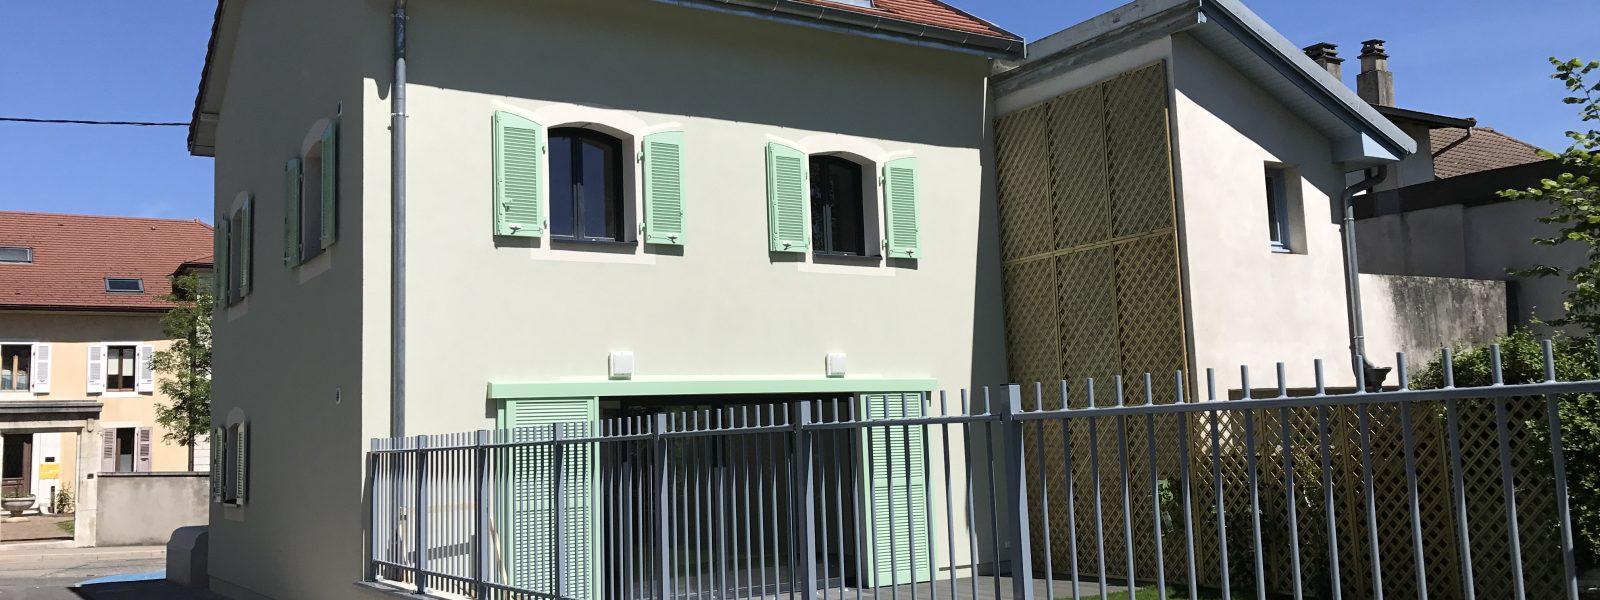 L'HORLOGERIE - Visuel 2 - Impact immobilier 01